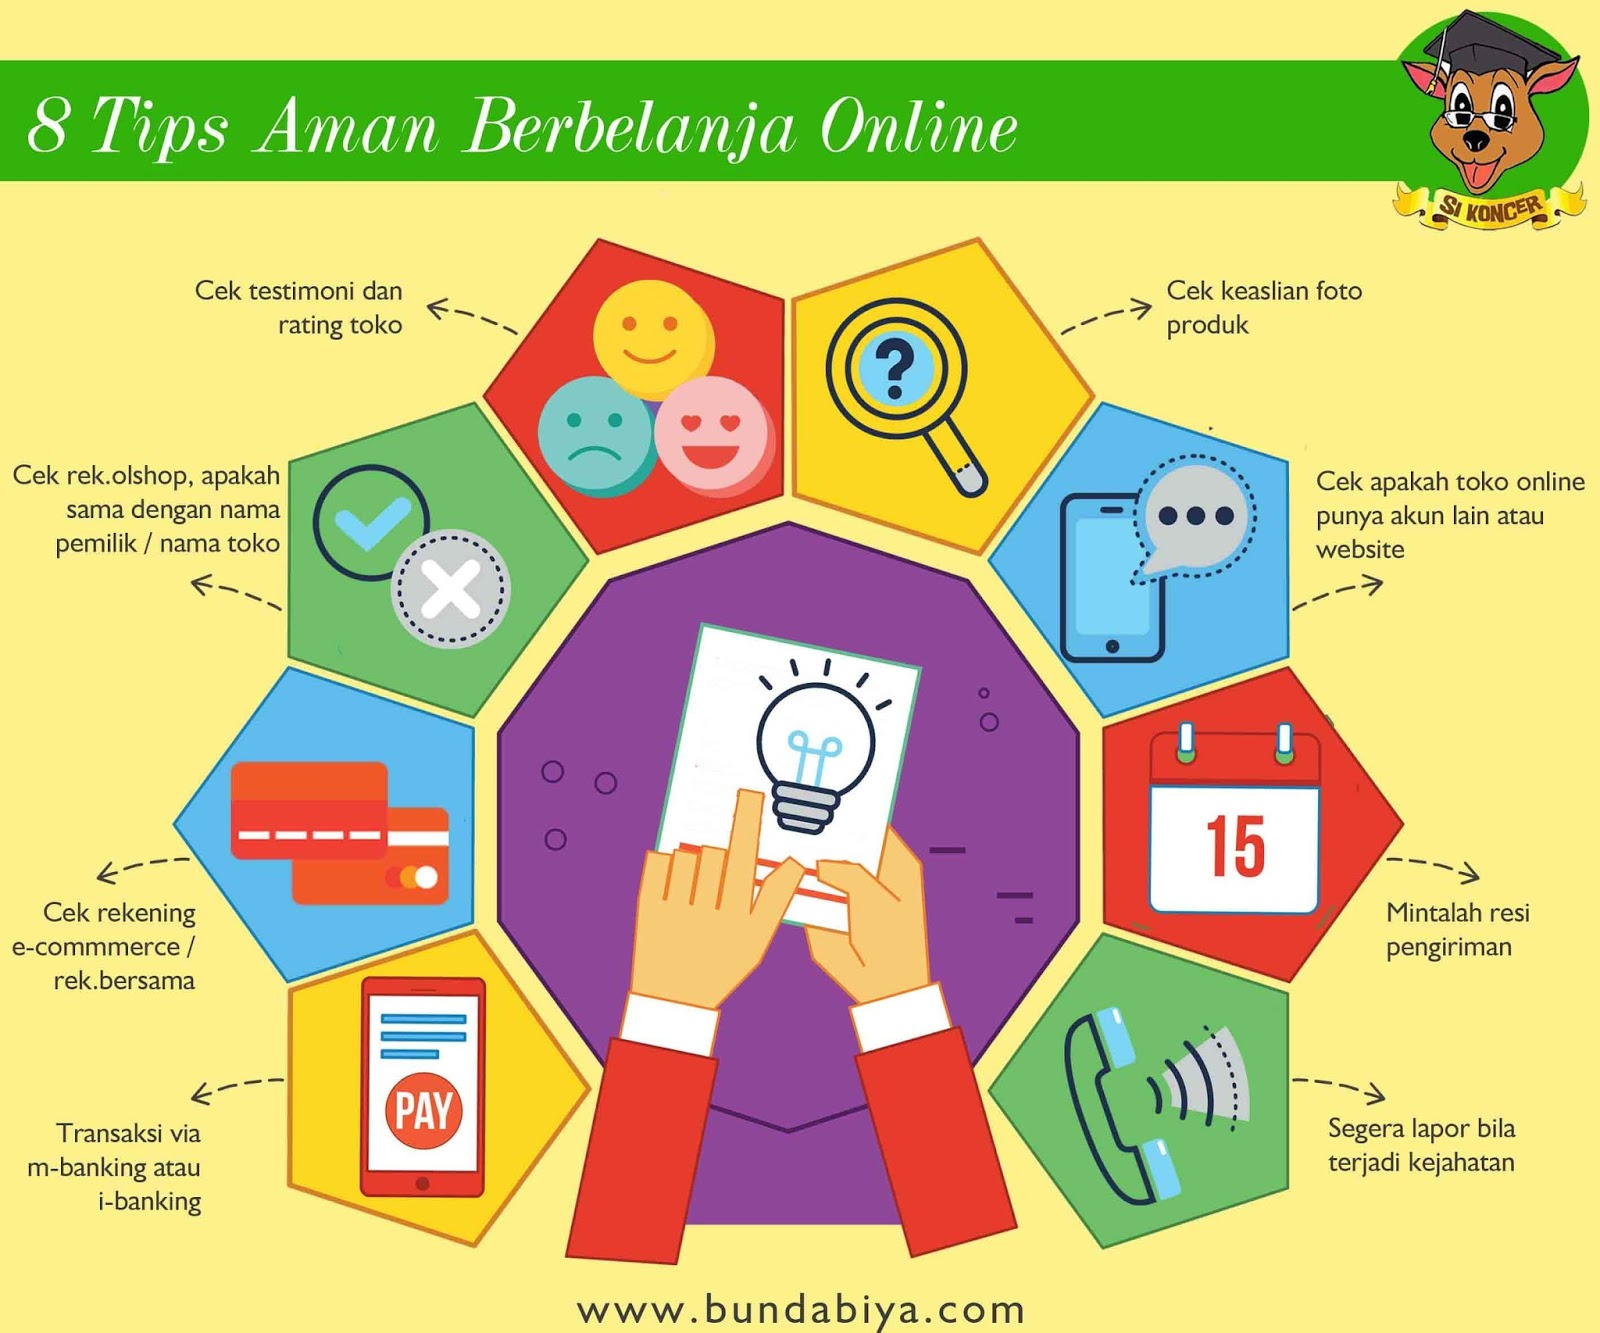 harkonas, harkonas 2018, lomba blog harkonas, tips belanja online, tips aman belanja online, koncer adalah, tips konsumen cerdas, konsumen cerdas di era digital